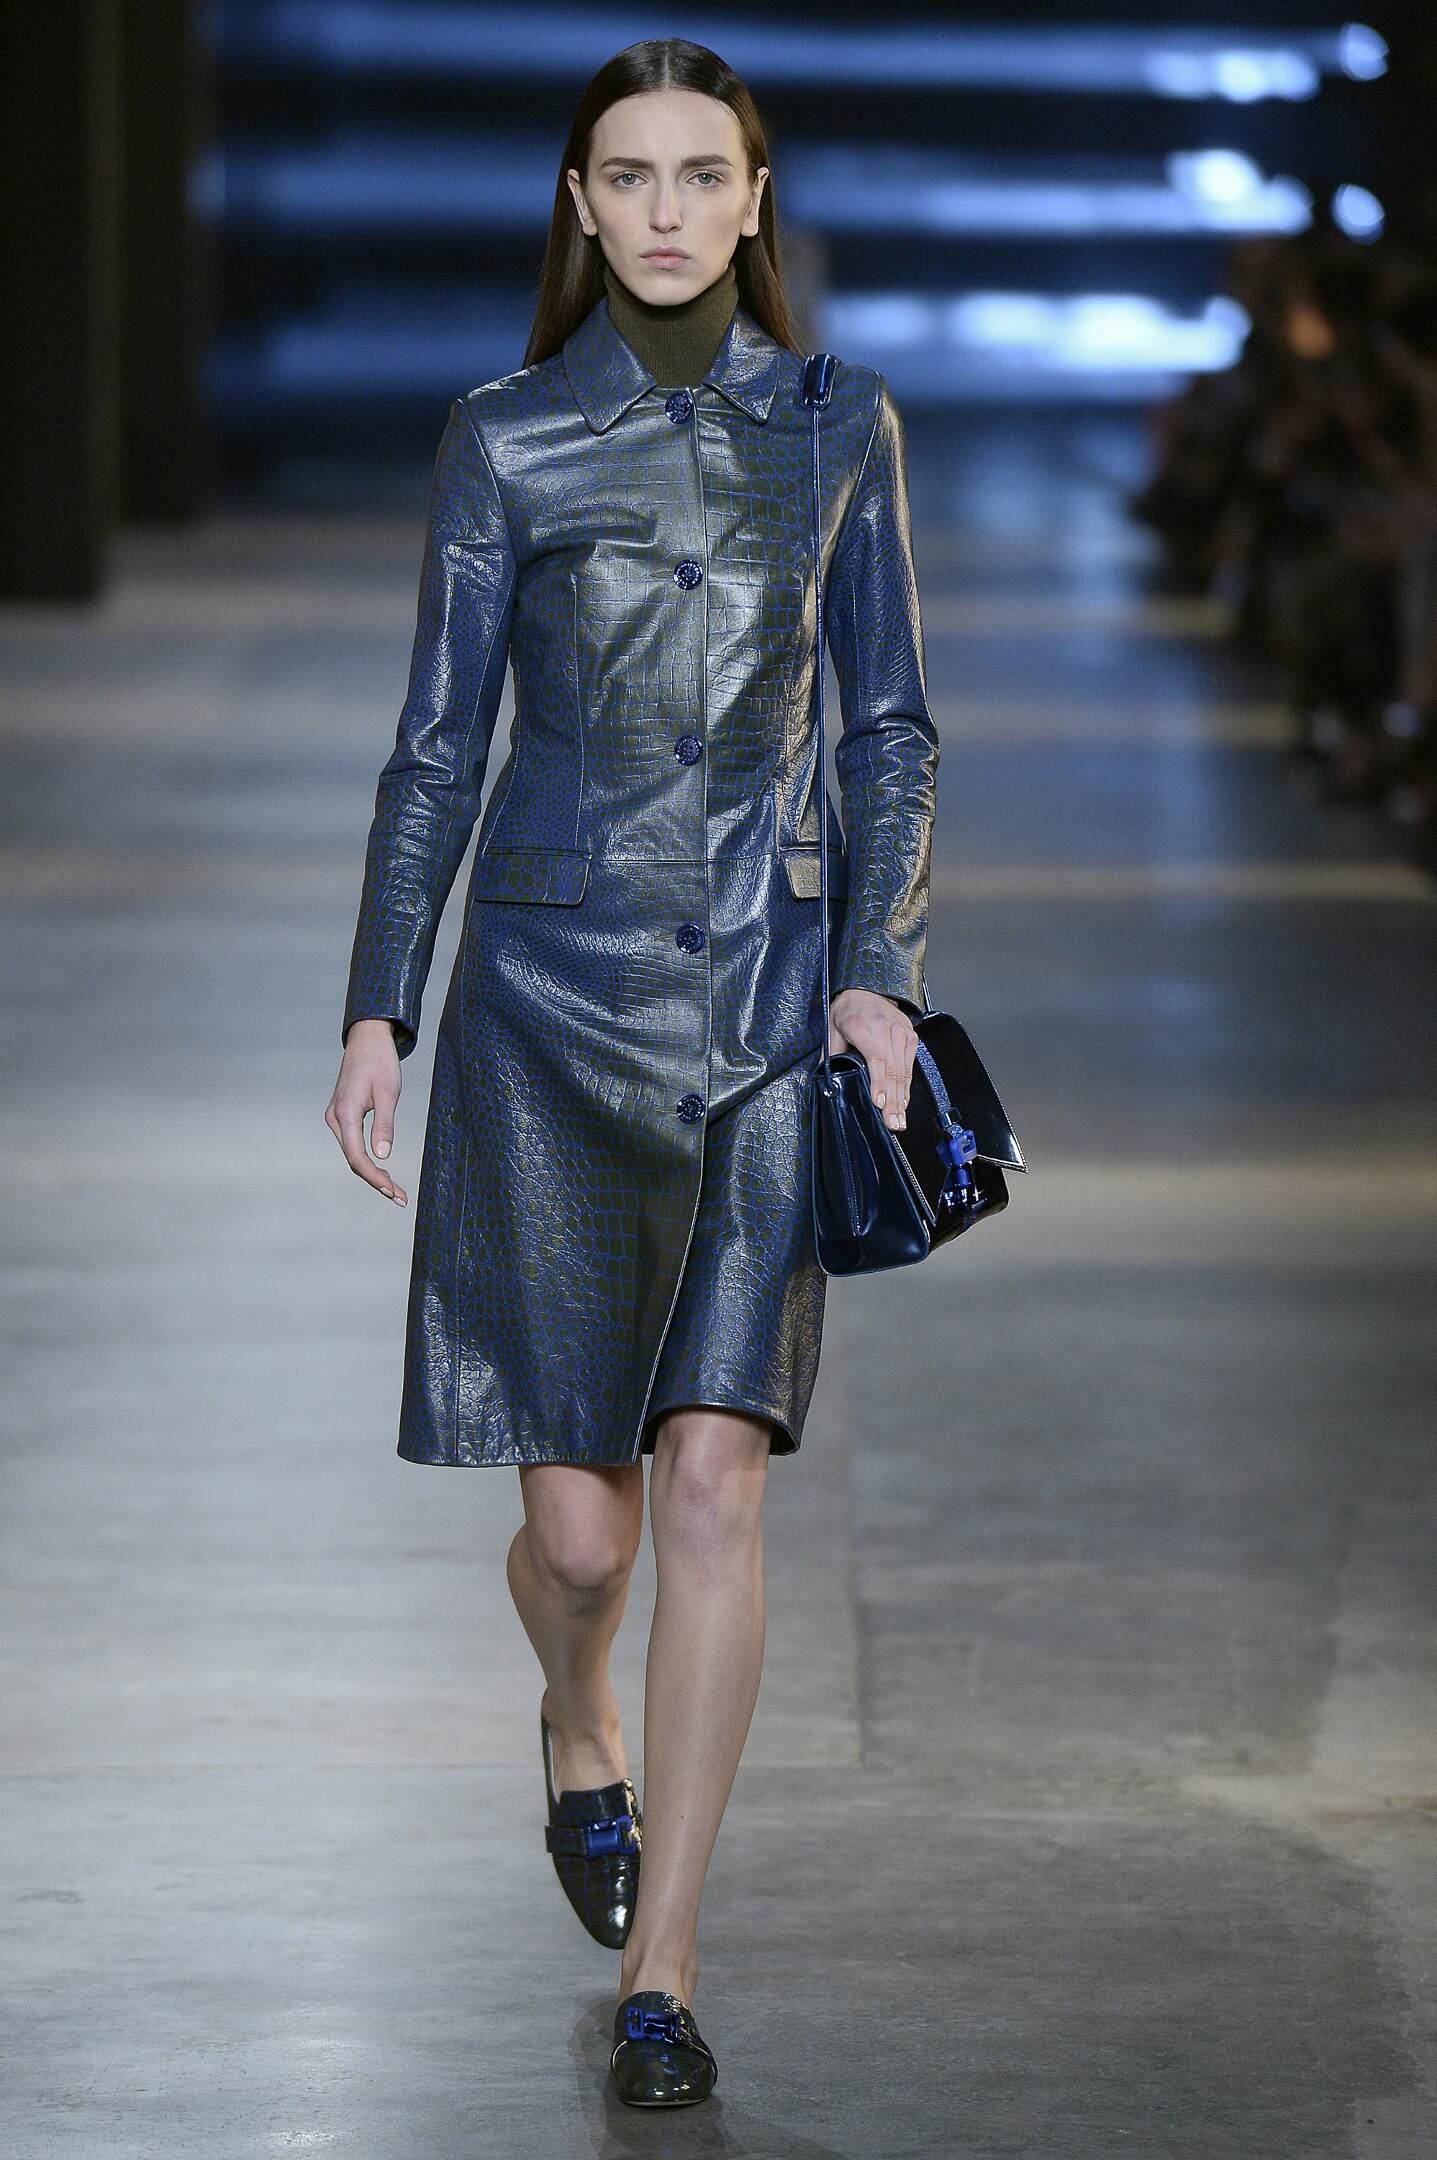 2016 Fall Fashion Woman Christopher Kane Collection